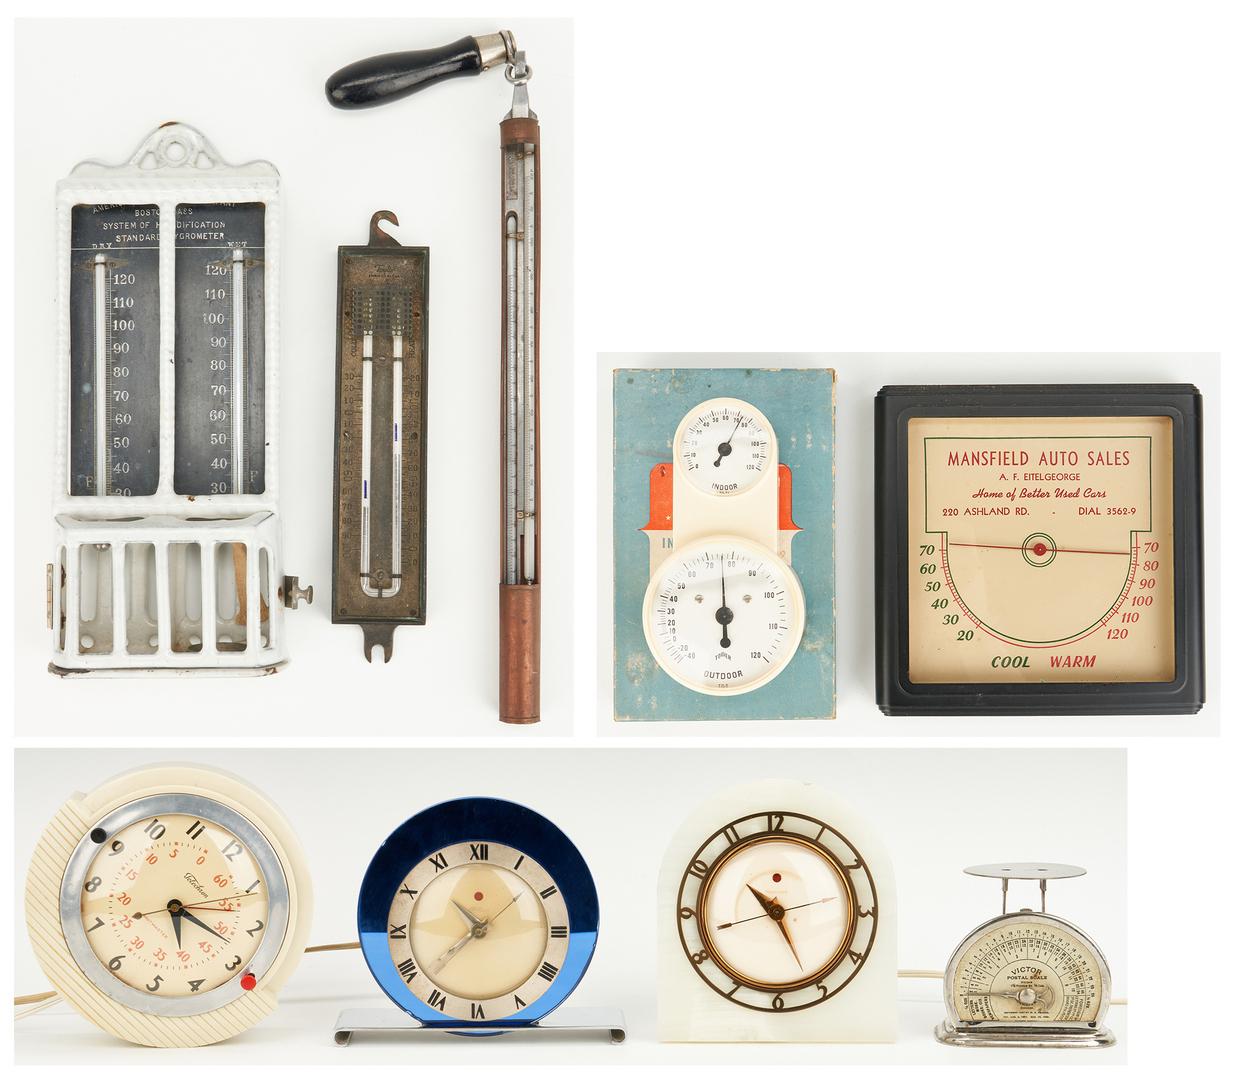 Lot 1048: 8 American Clocks & Weather Gauges, 9 items